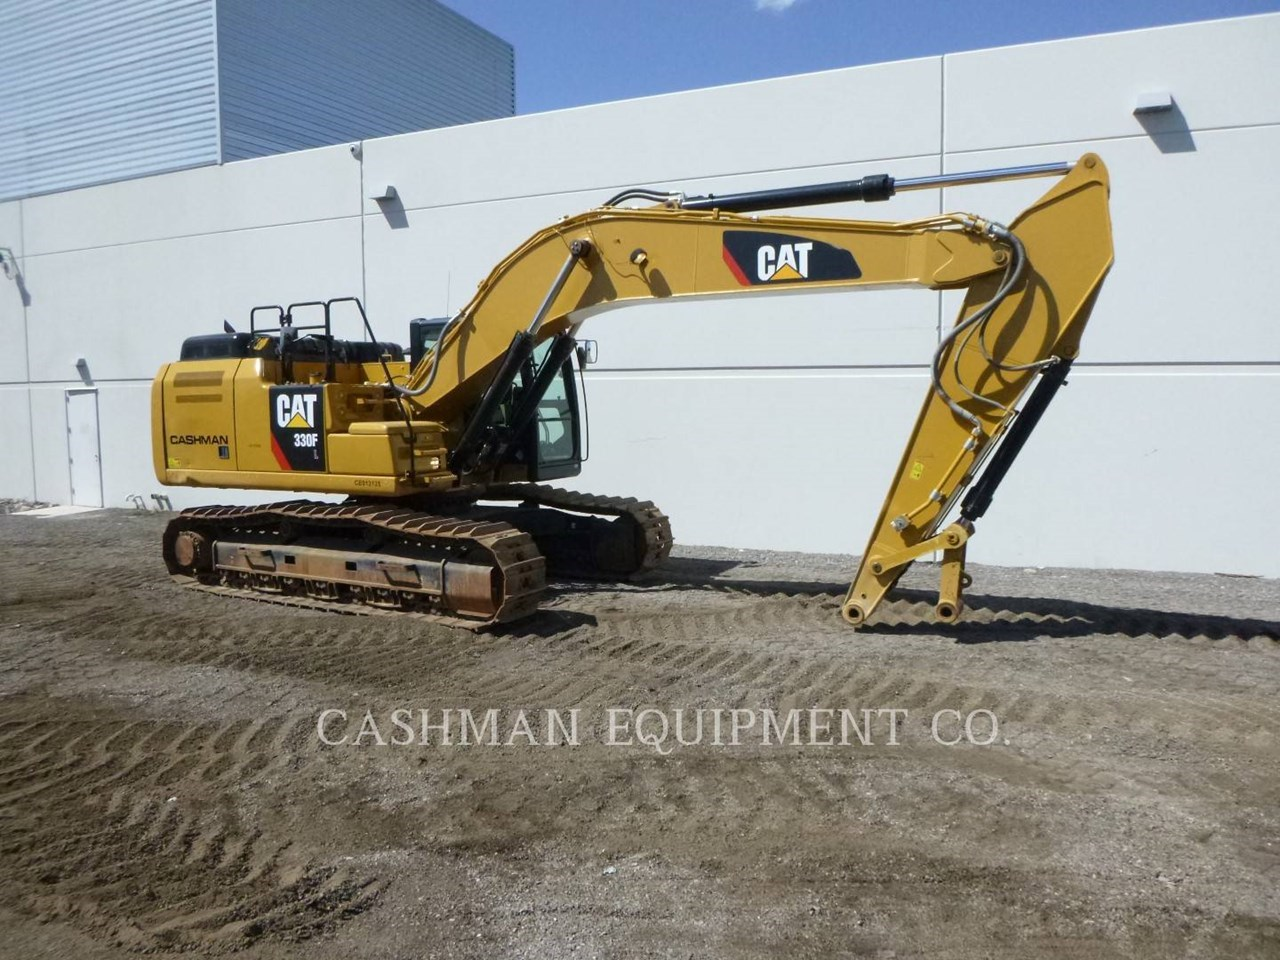 2018 Caterpillar 330FL Image 2